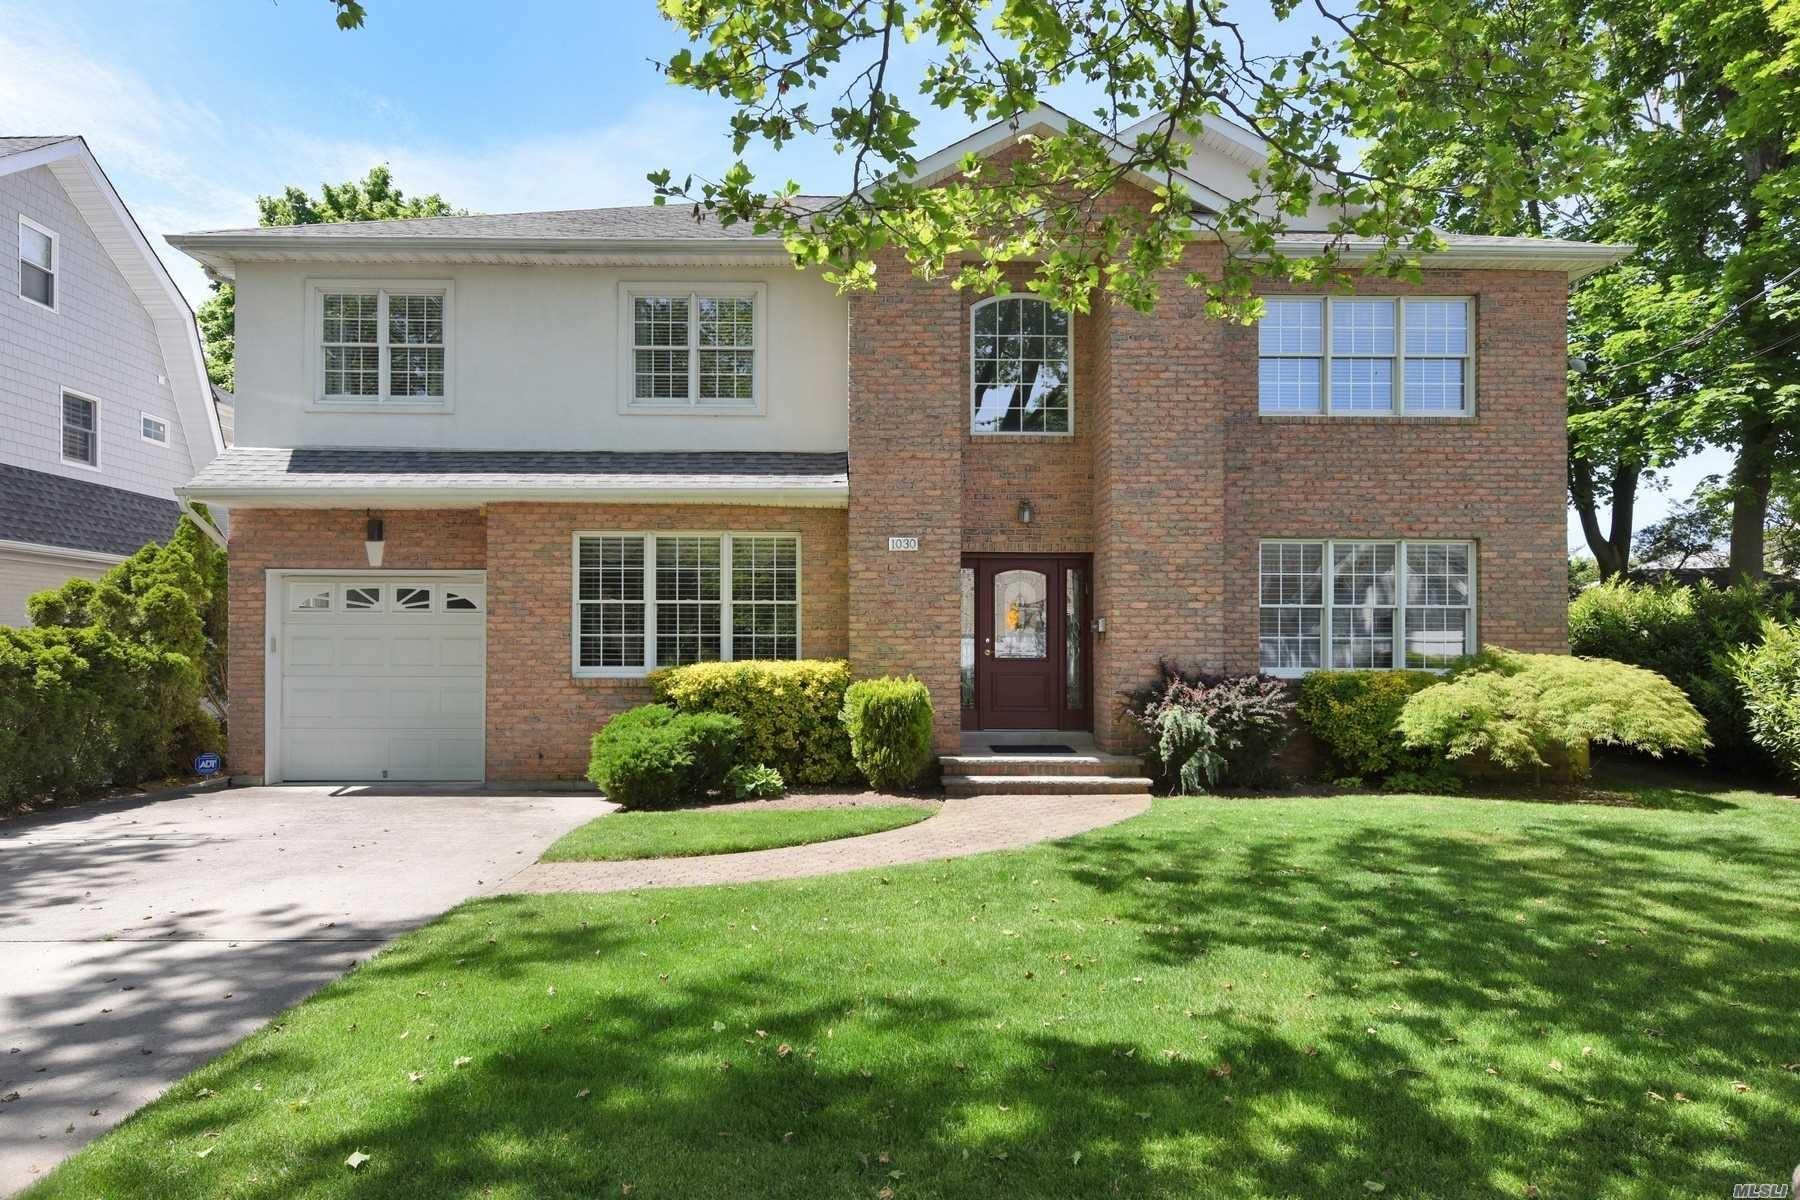 1030 Crestwood Rd, Woodmere, NY 11598 - MLS#: 3219791